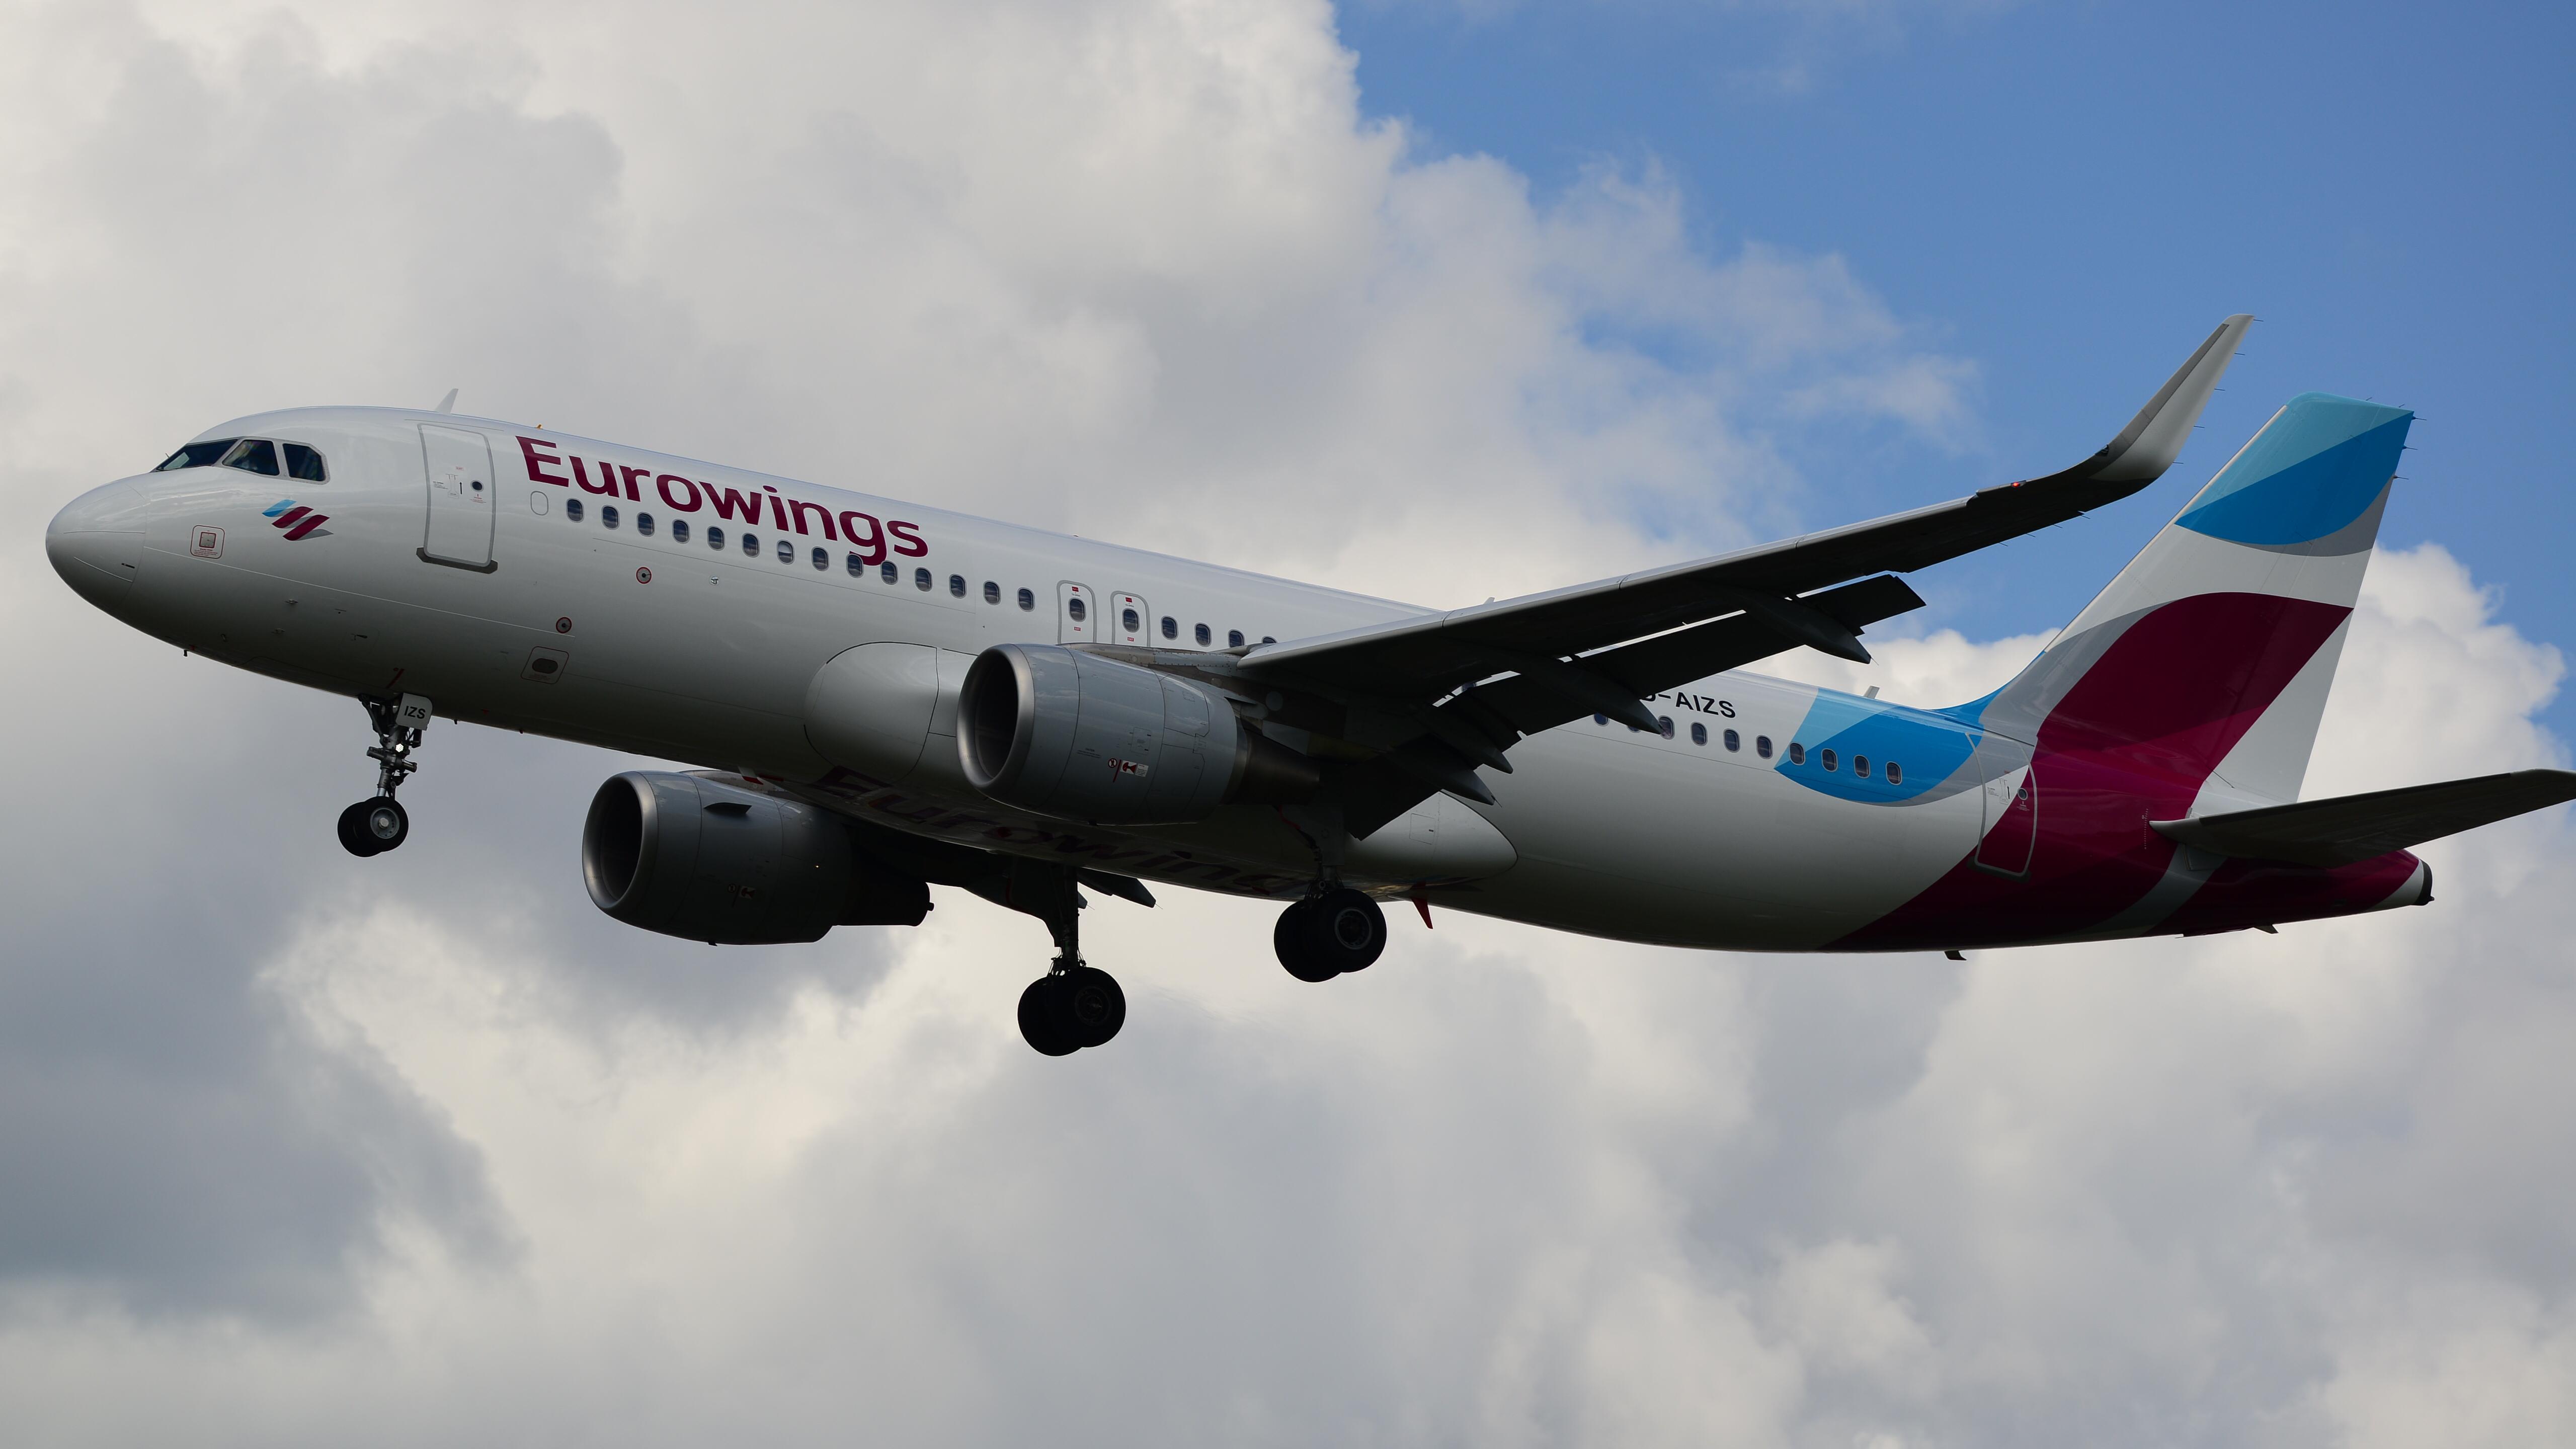 File Eurowings D Aizs Airbus A320 17136092688 Jpg